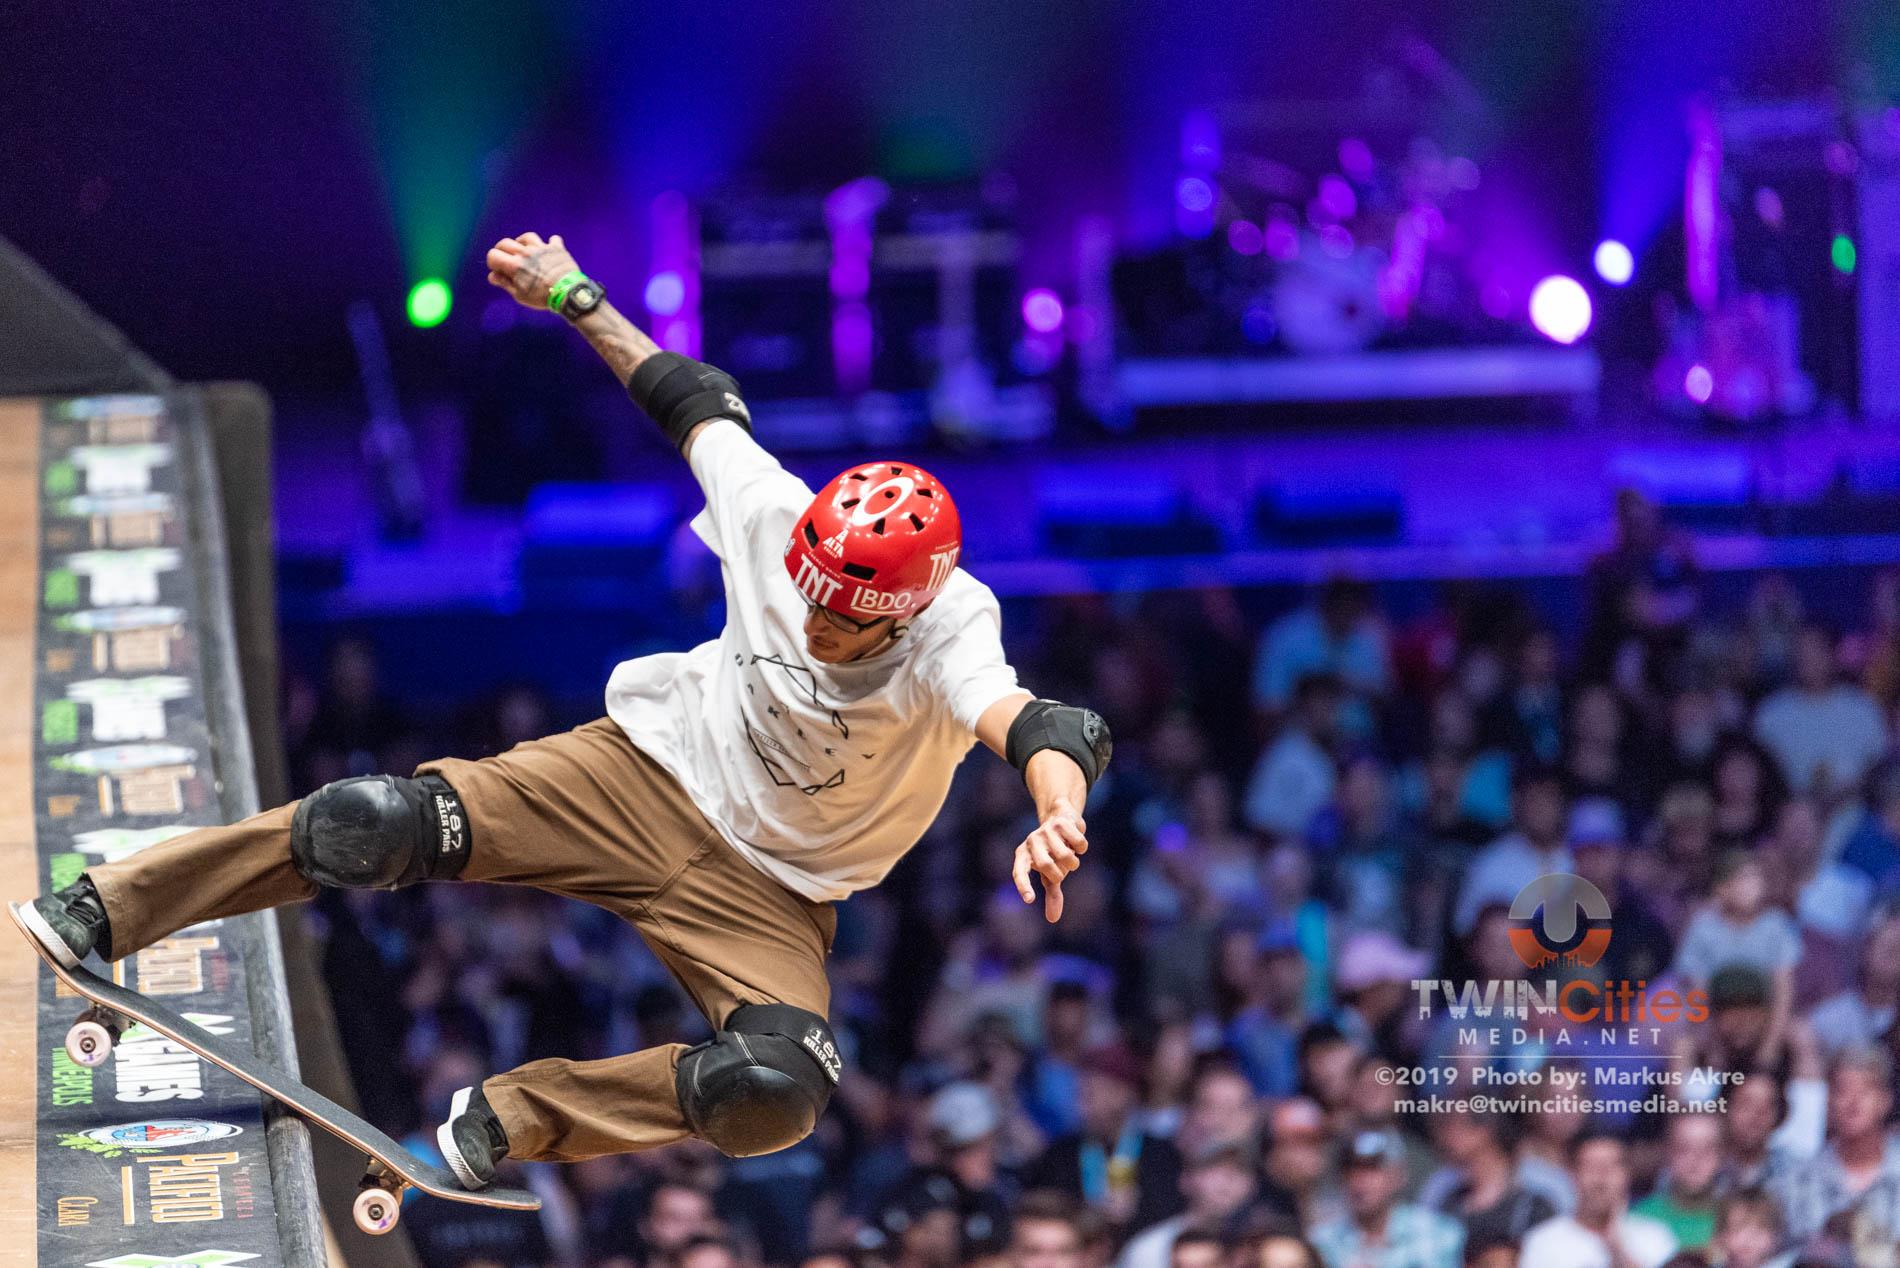 2019-X-Games-Day-1-Skateboard-Vert-8